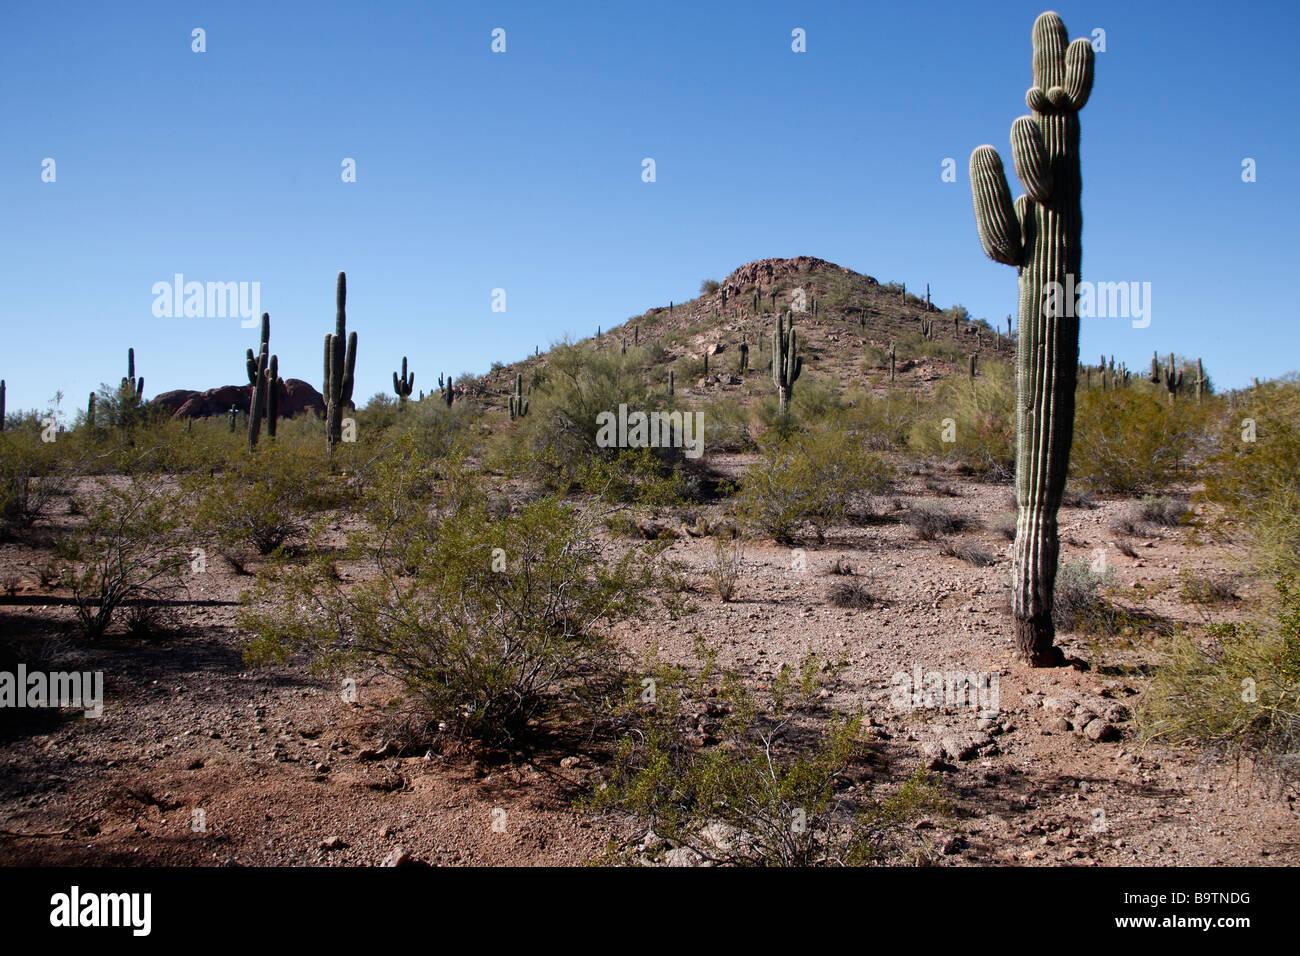 Cactus plants in desert Arizona USA Mostly saguaro cactus - Stock Image